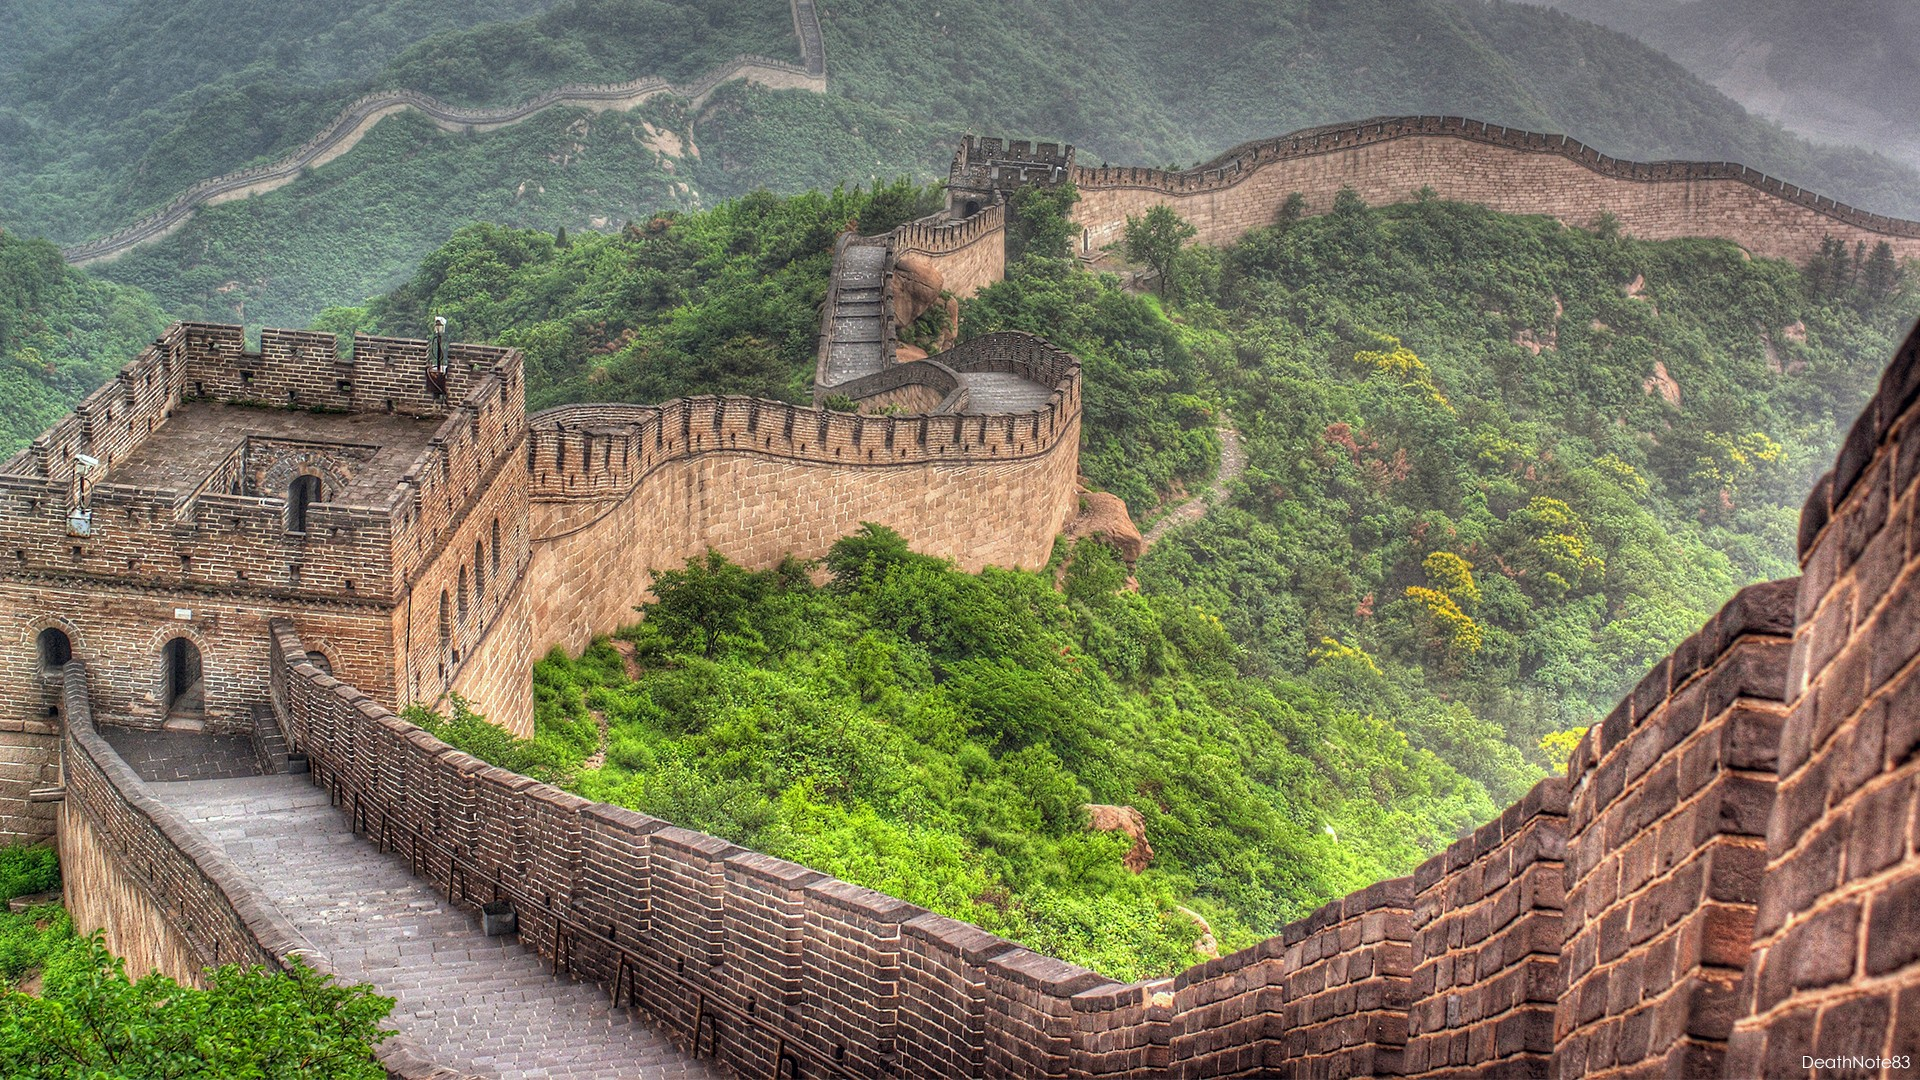 great wall of china hd free